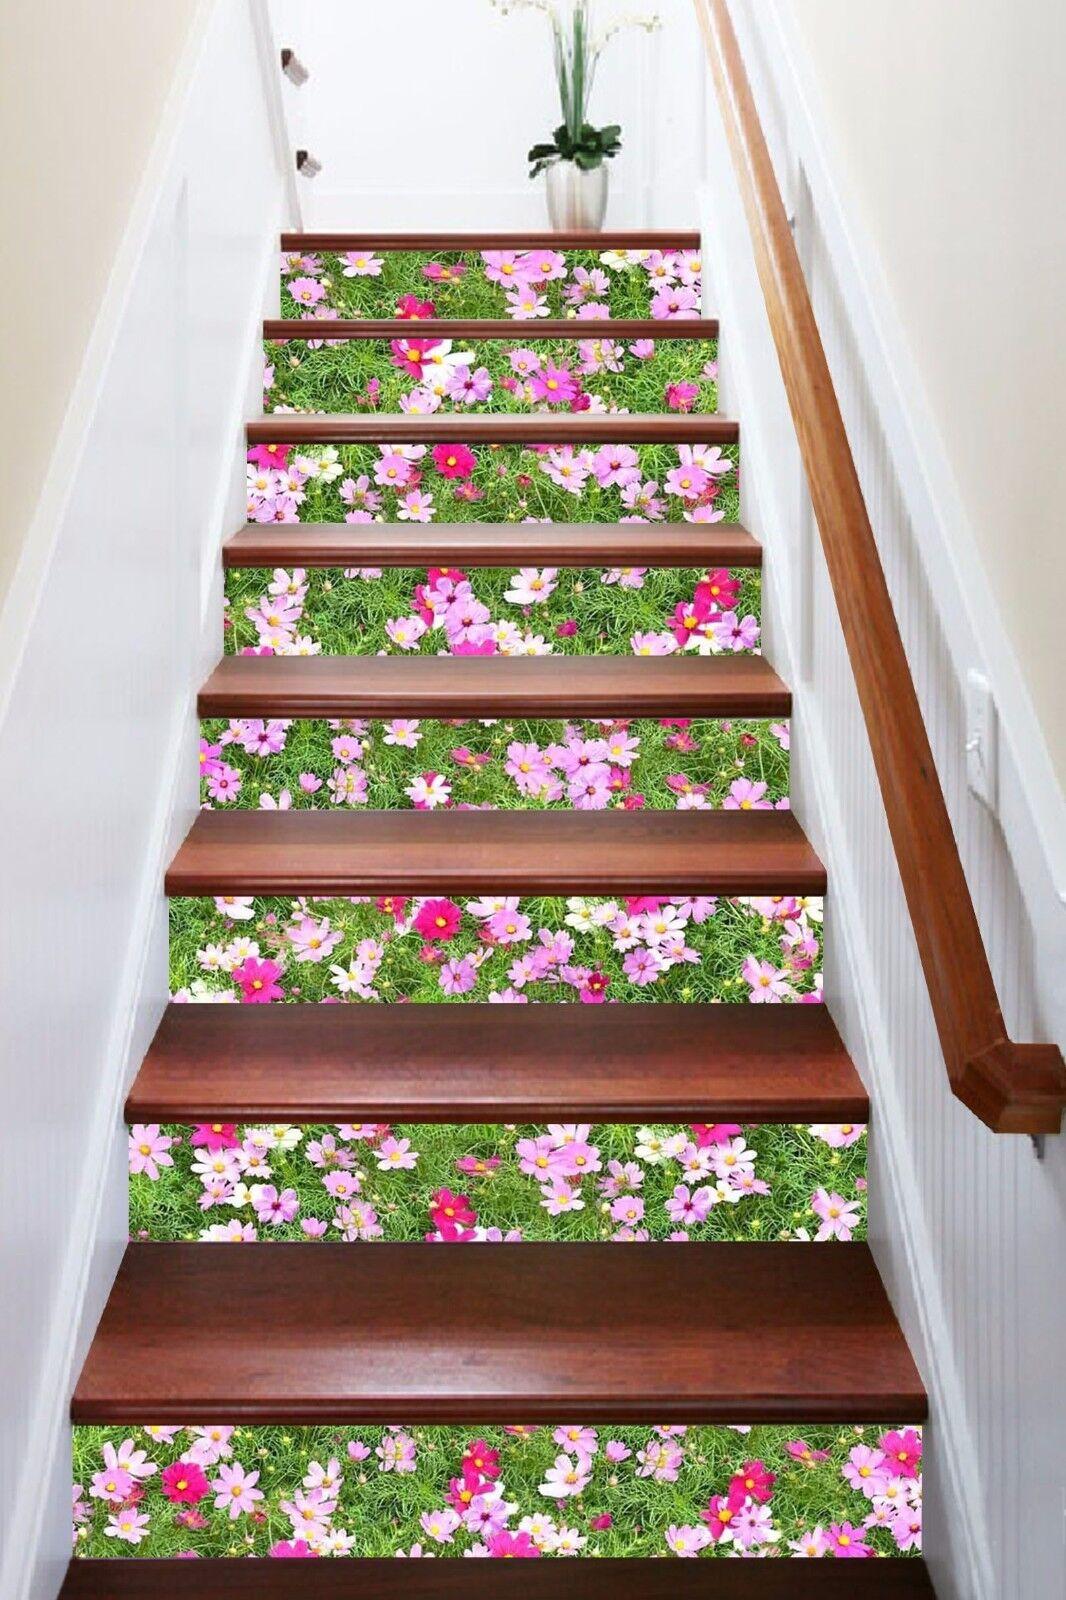 3D Flower 5001 Stair Risers Decoration Photo Mural Vinyl Decal Wallpaper AU